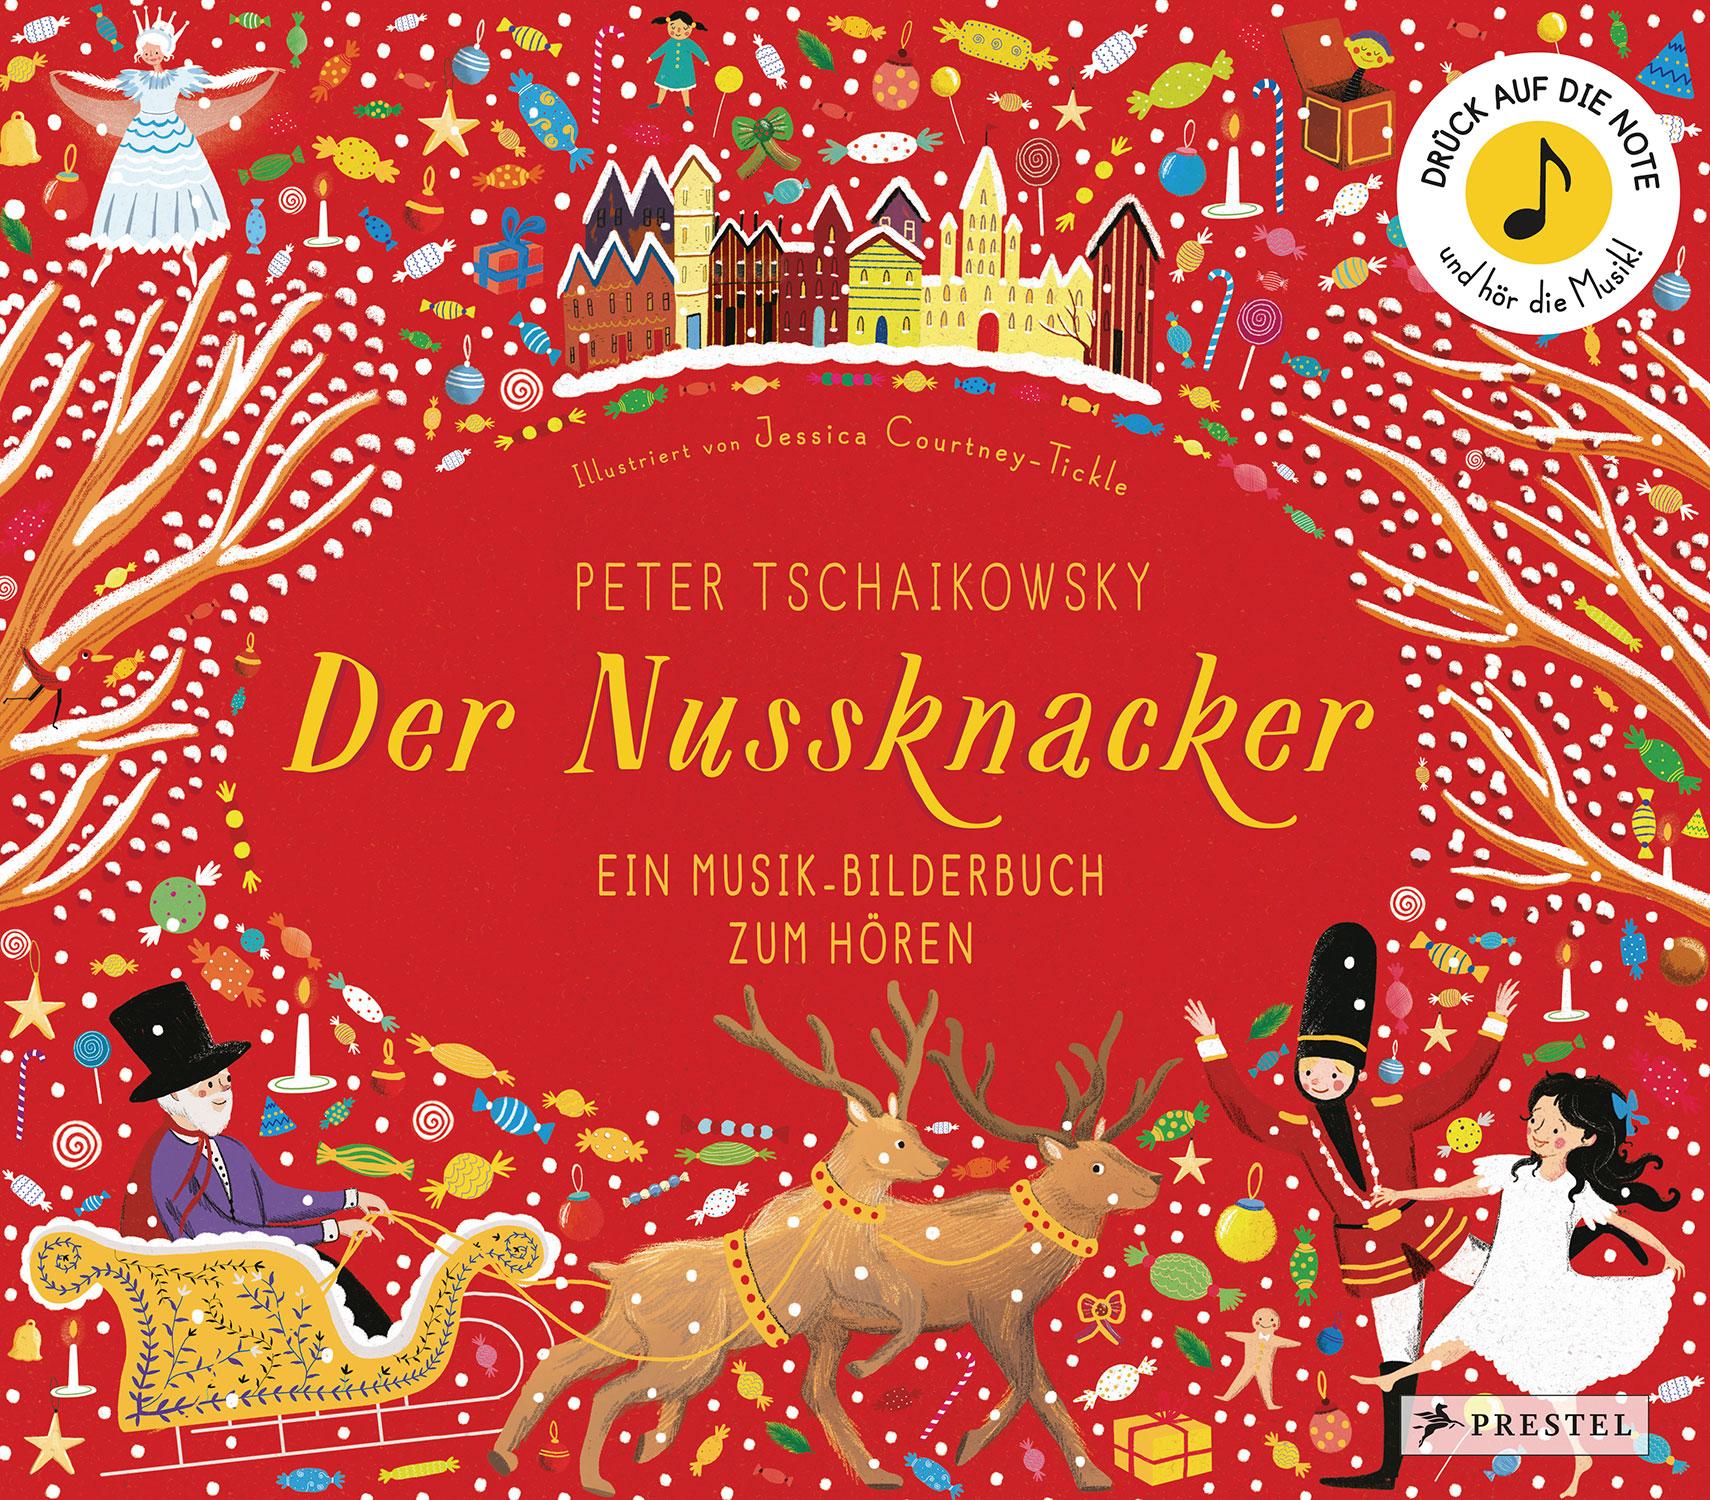 »PETER TASCHAIKOWSKY. DER NUSSKNACKER« - PRESTEL